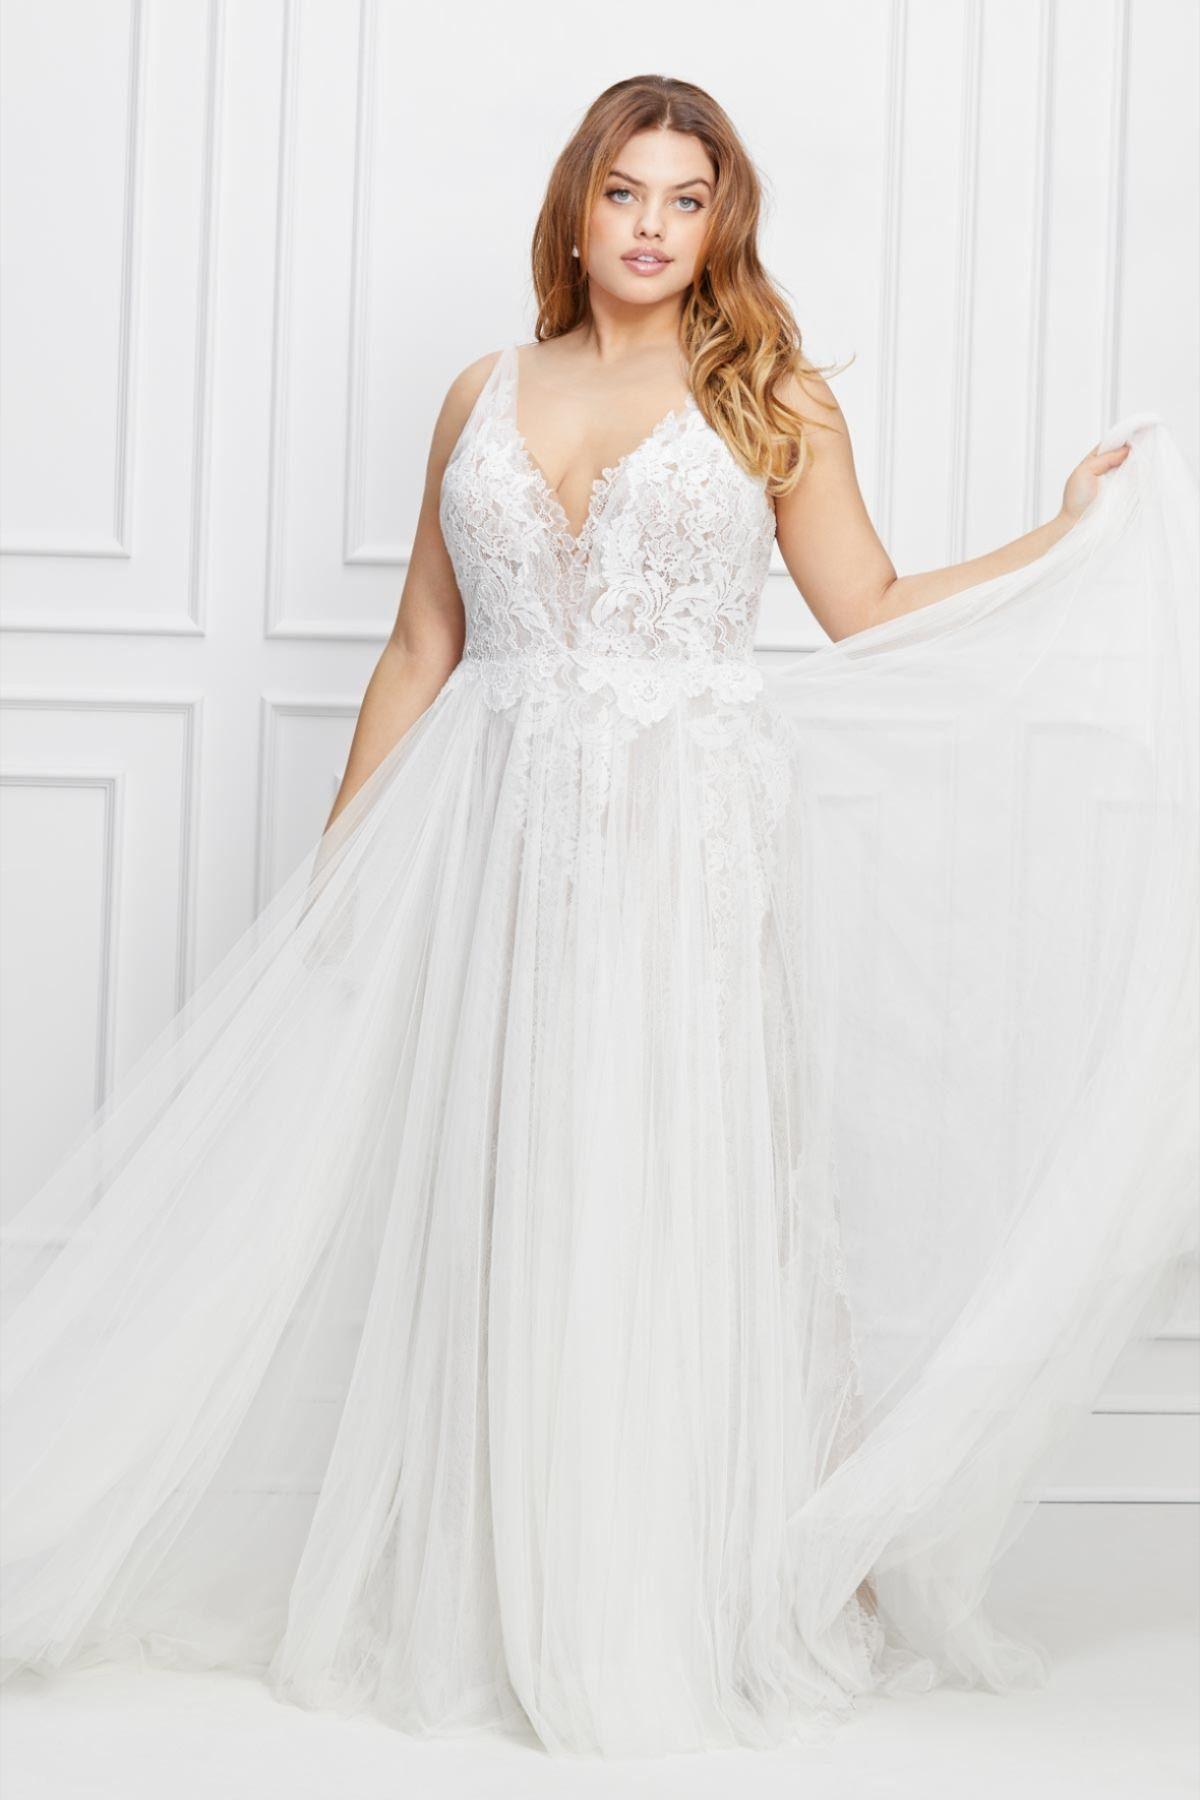 35+ Wedding dress sizes chart information